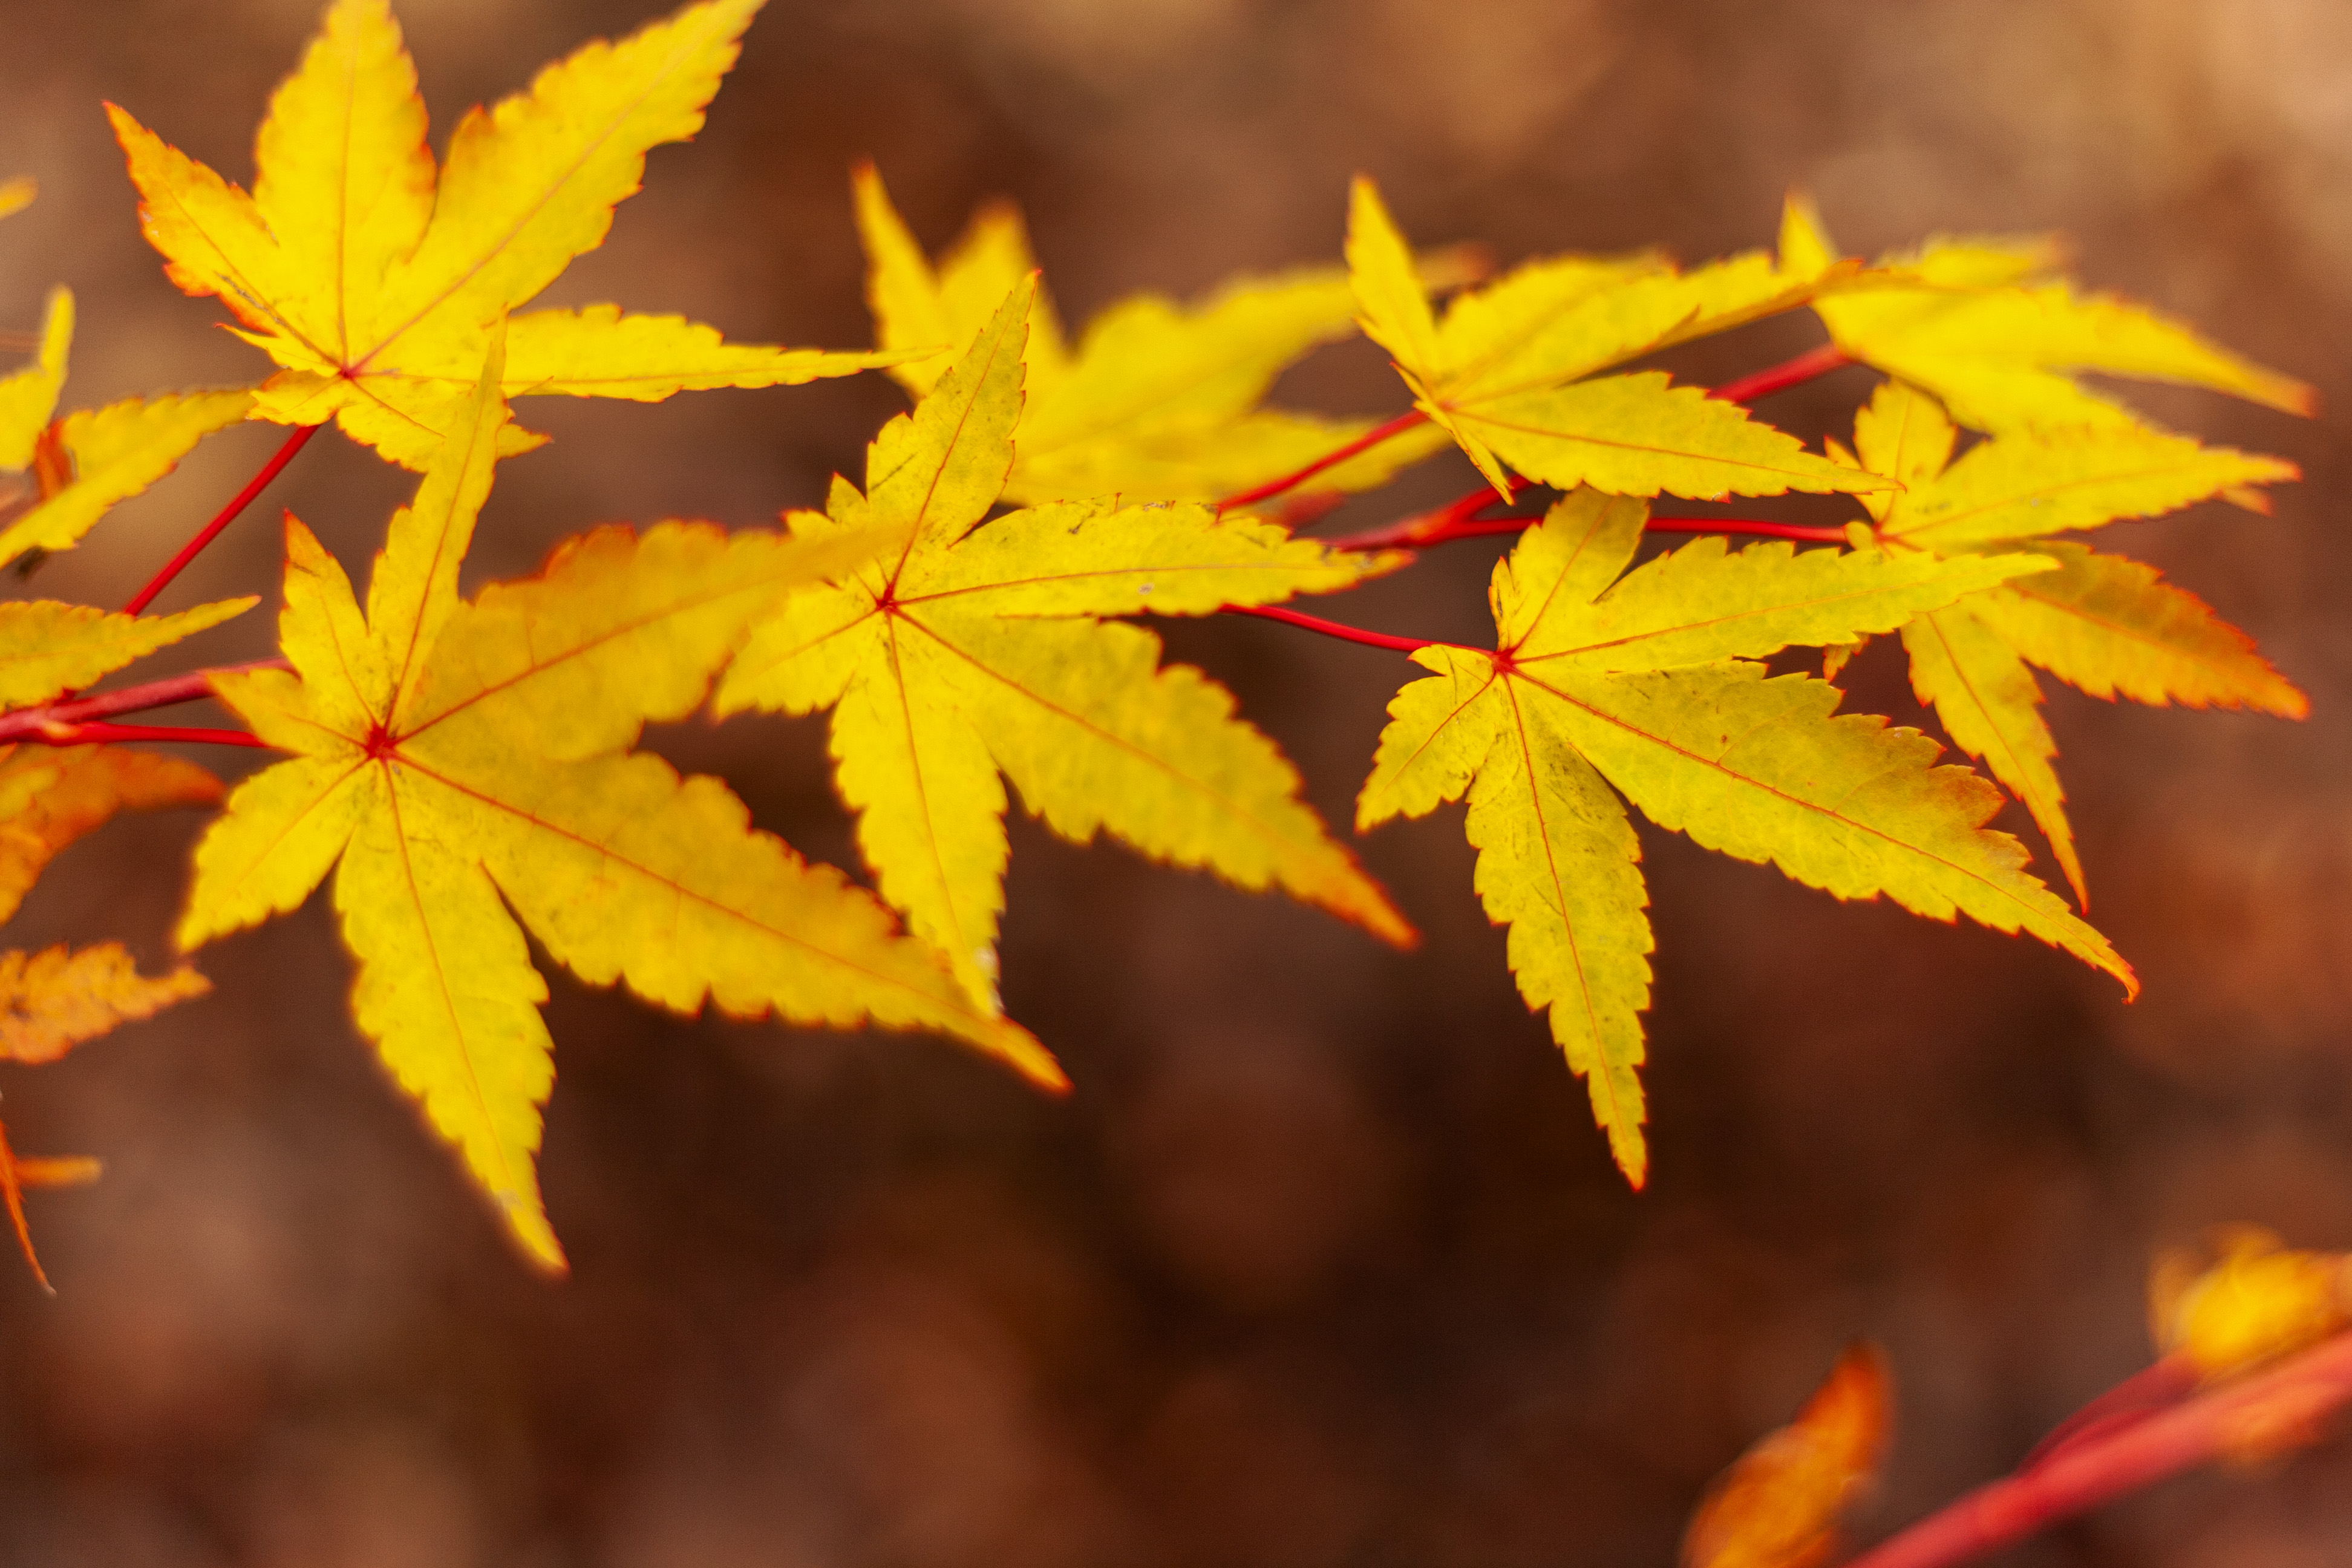 Japanese Maple, Fall Foliage